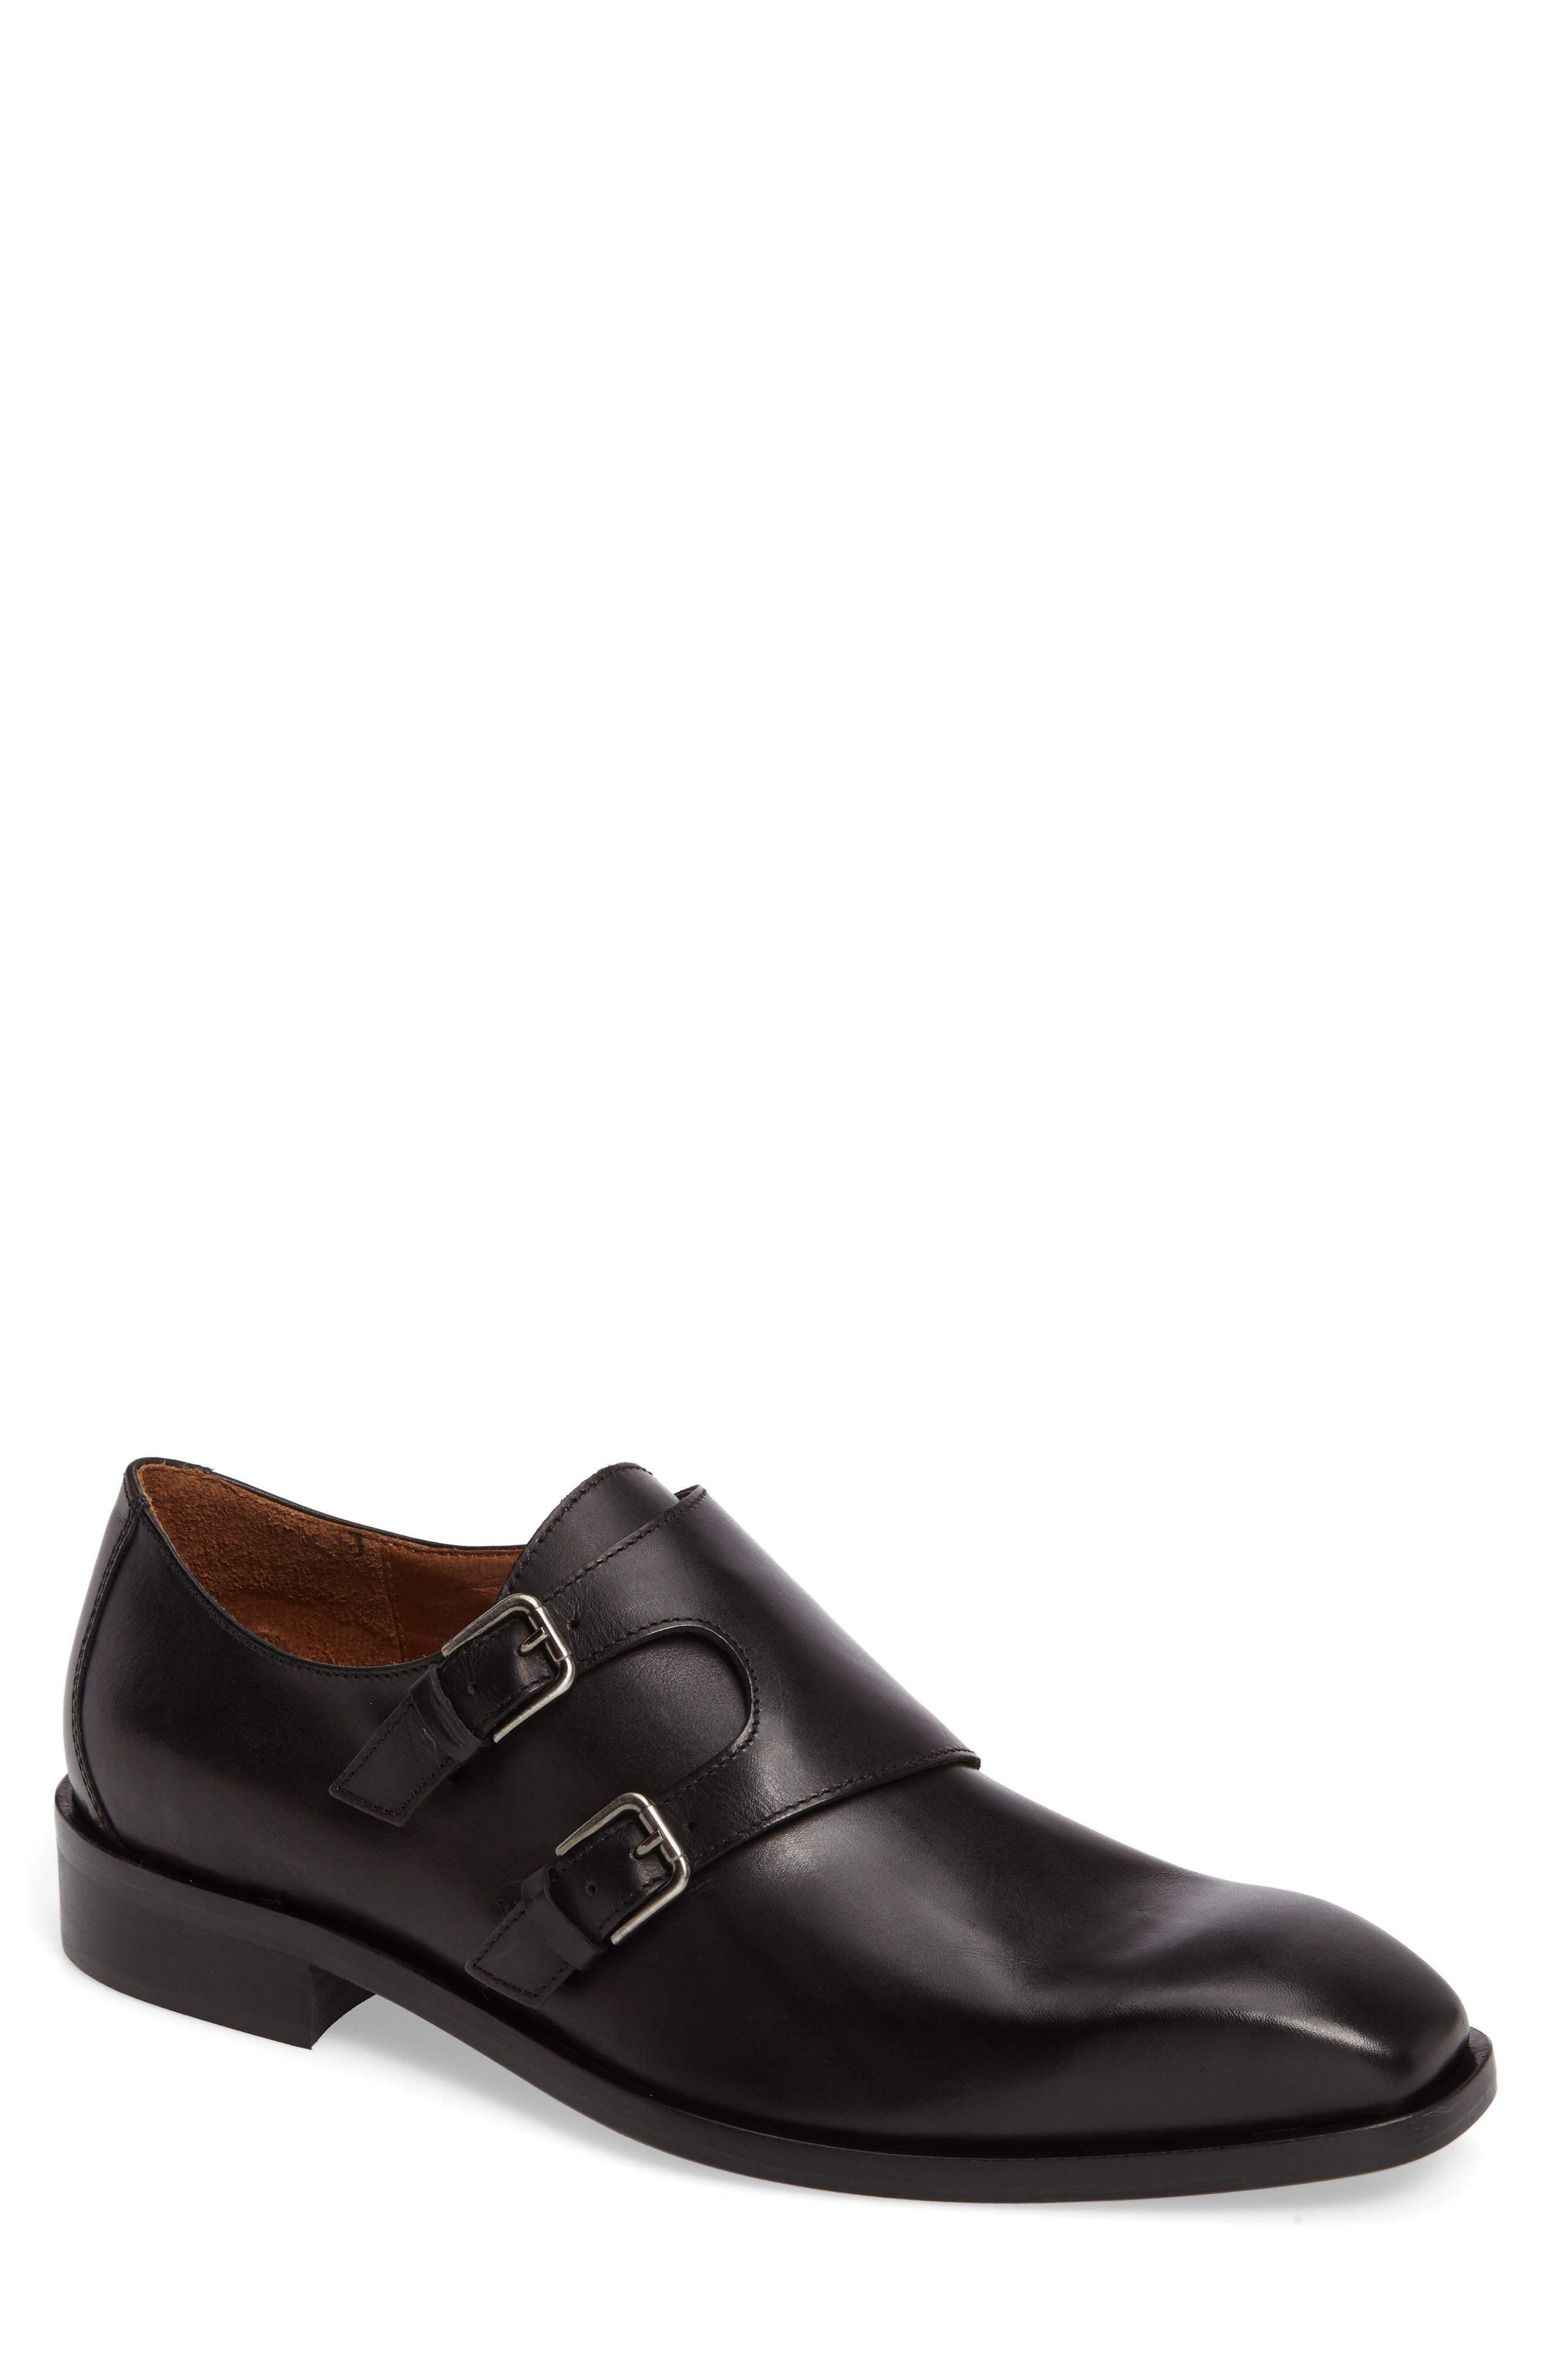 Vivaldo Venetian Loafer,                             Main thumbnail 1, color,                             Black Leather